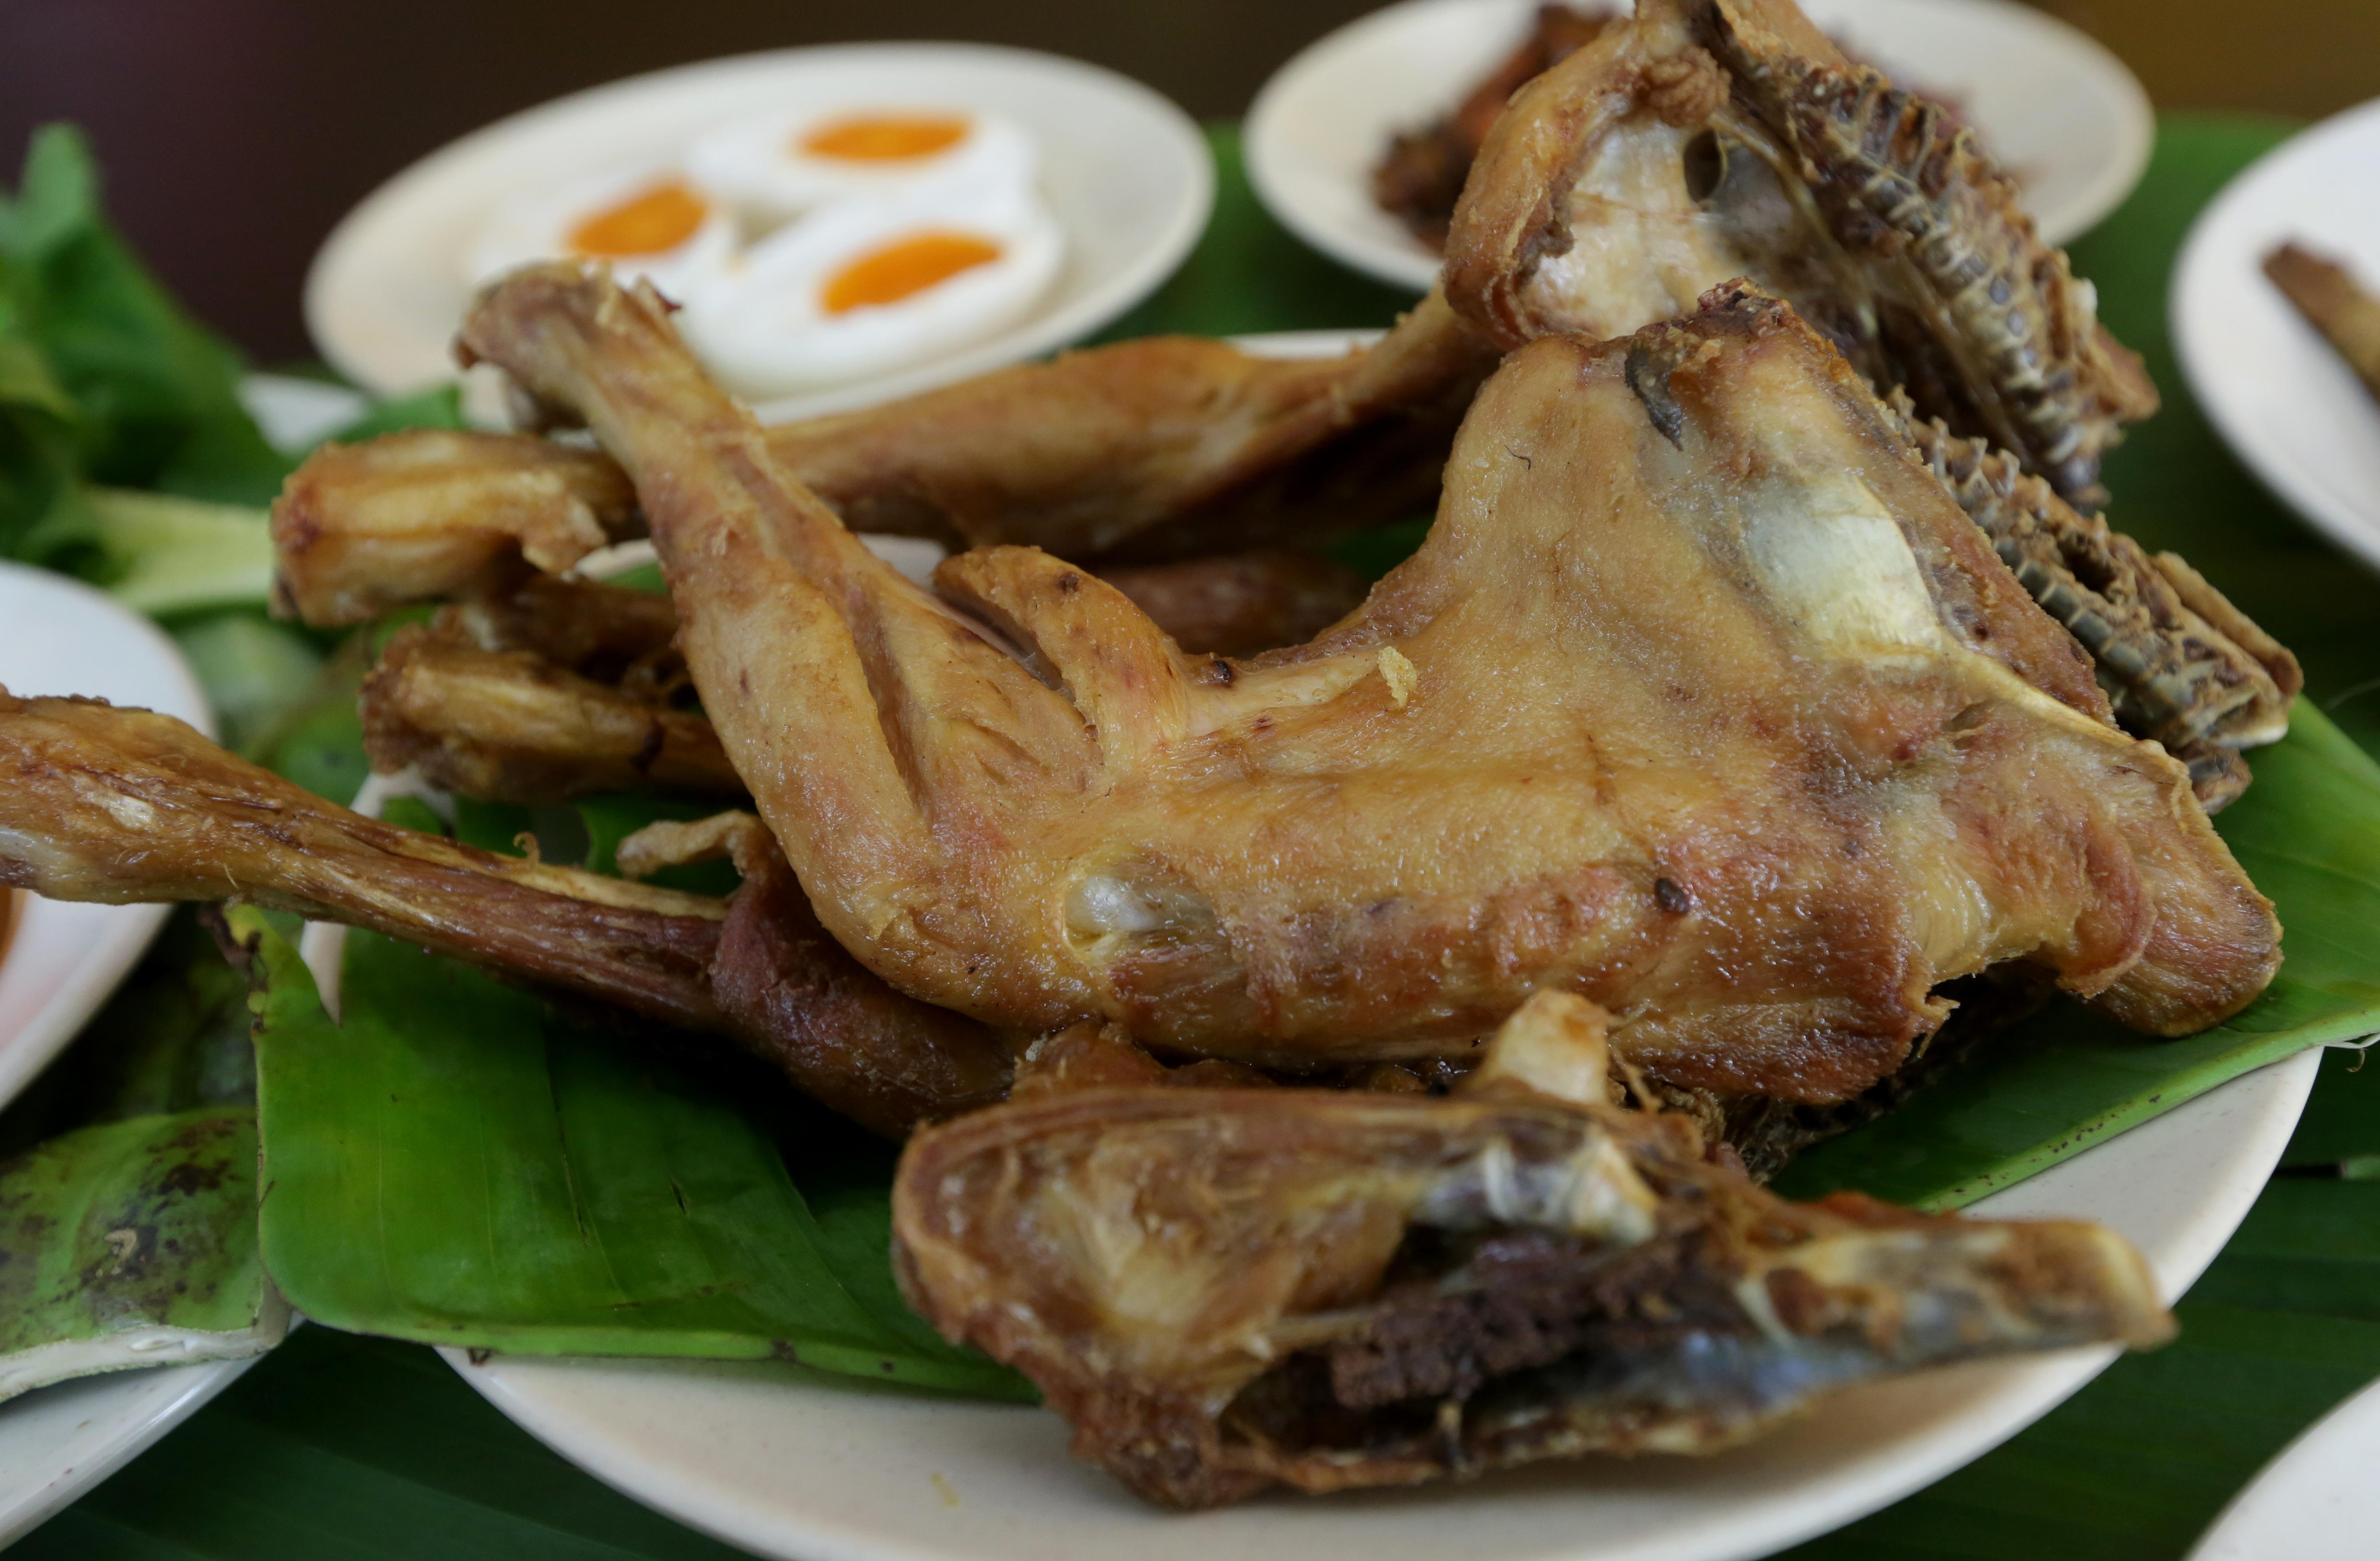 Ayam kampung dara goreng menjadi menu istimewa di Restoran Man Ayam Kampung Seri Kembangan.